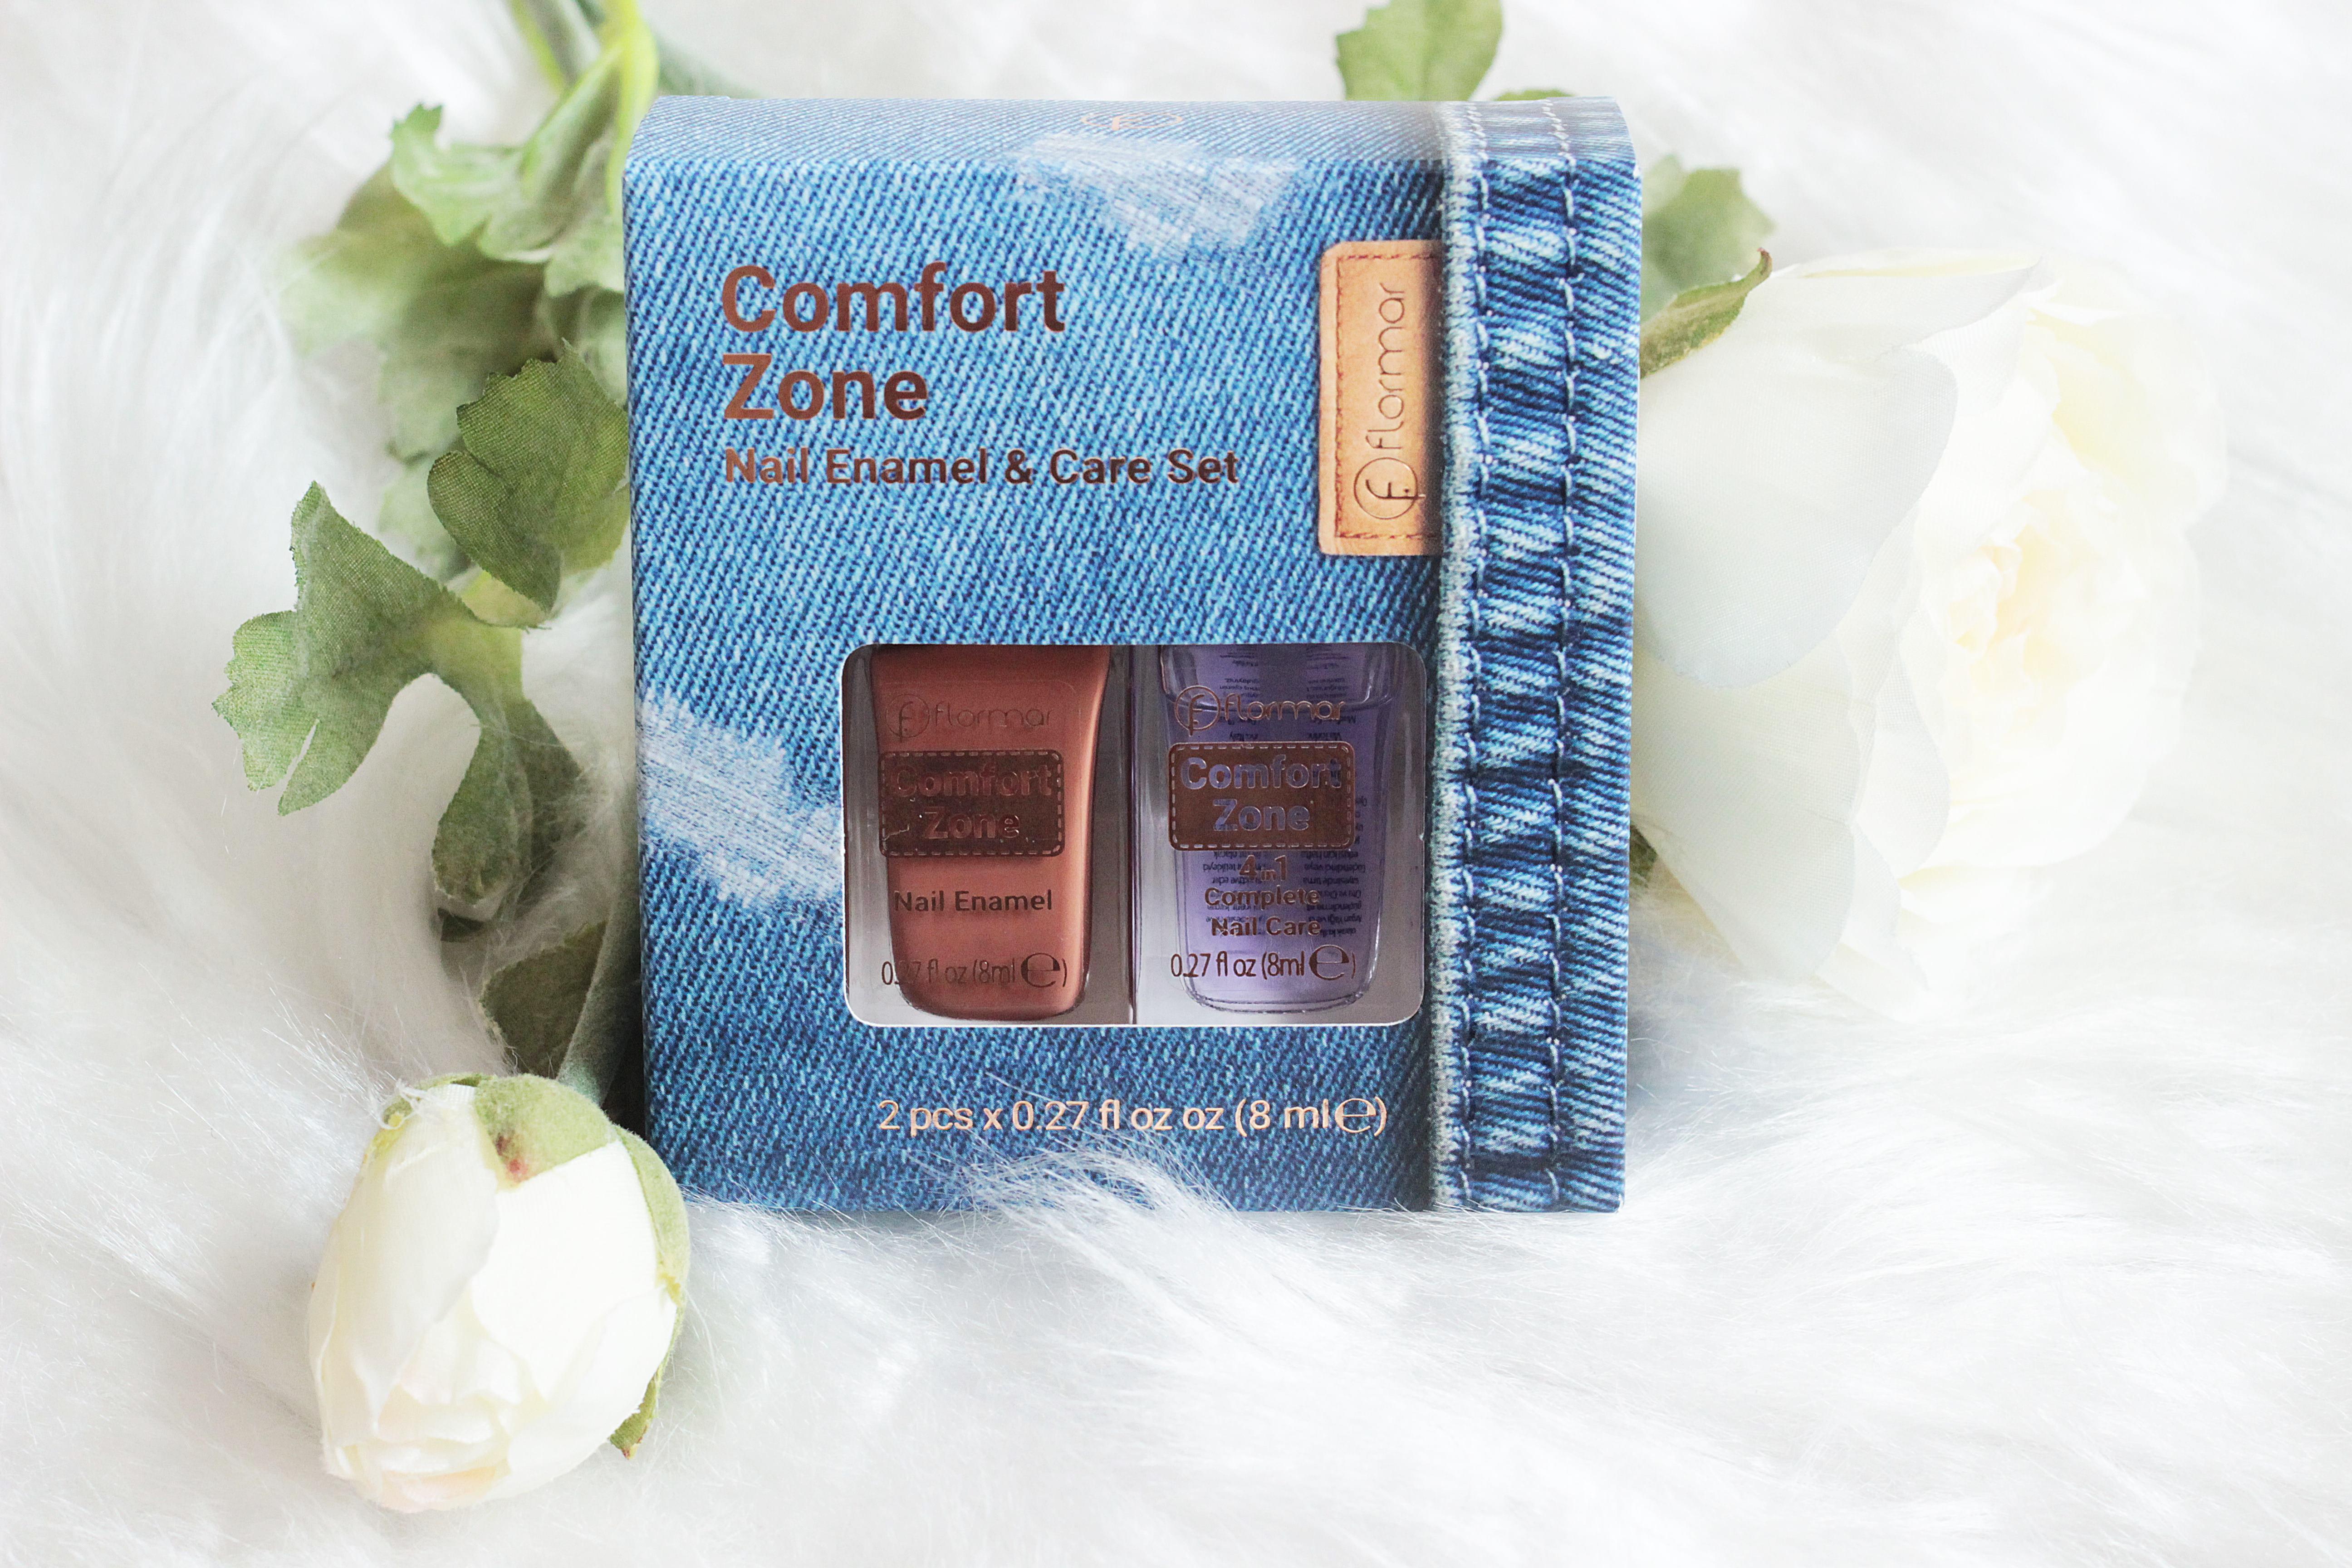 flormar-comfortzone-oje